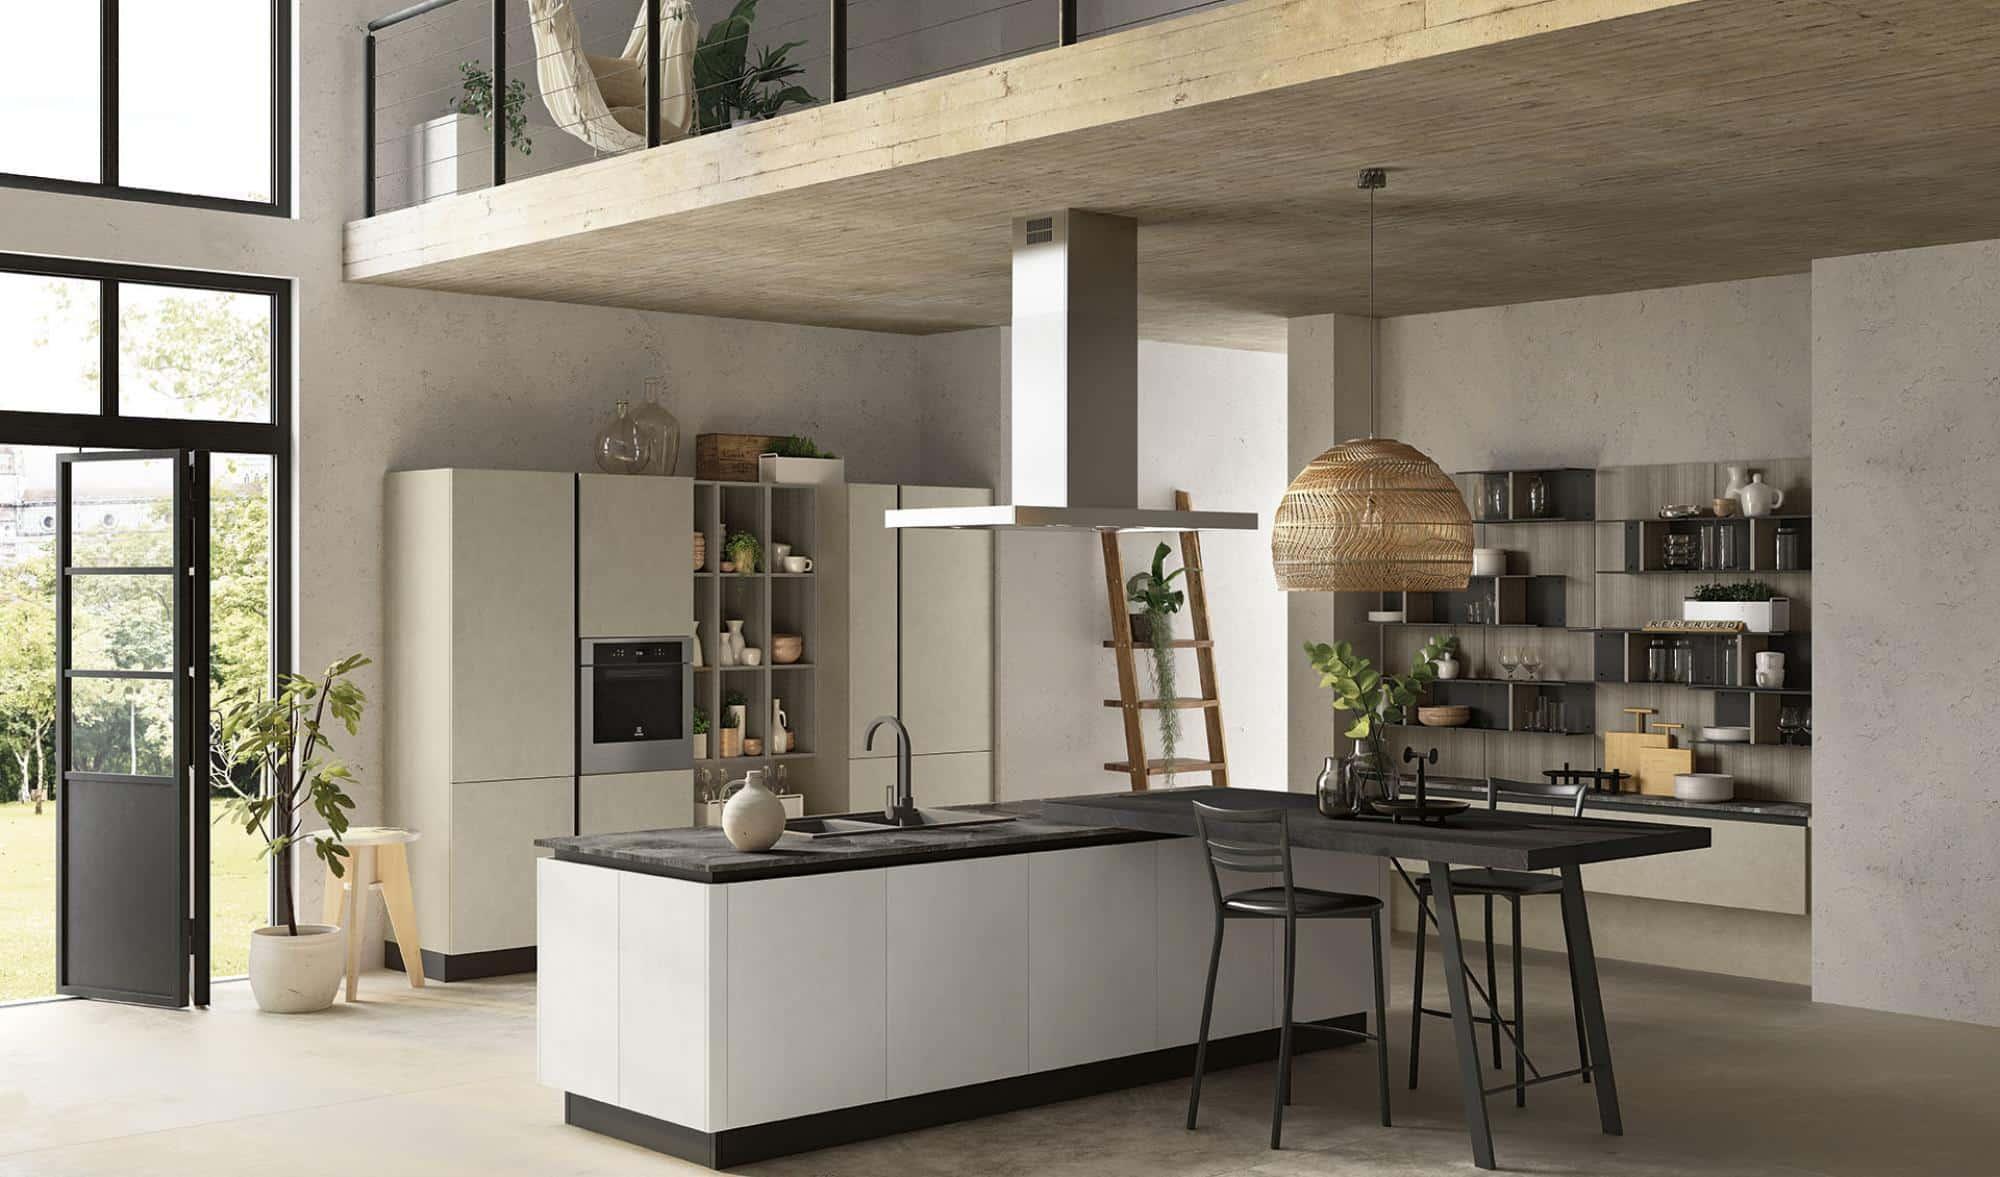 Lungomare κουζινα χωρις πομολο με υφη τσιμέντου λευκο